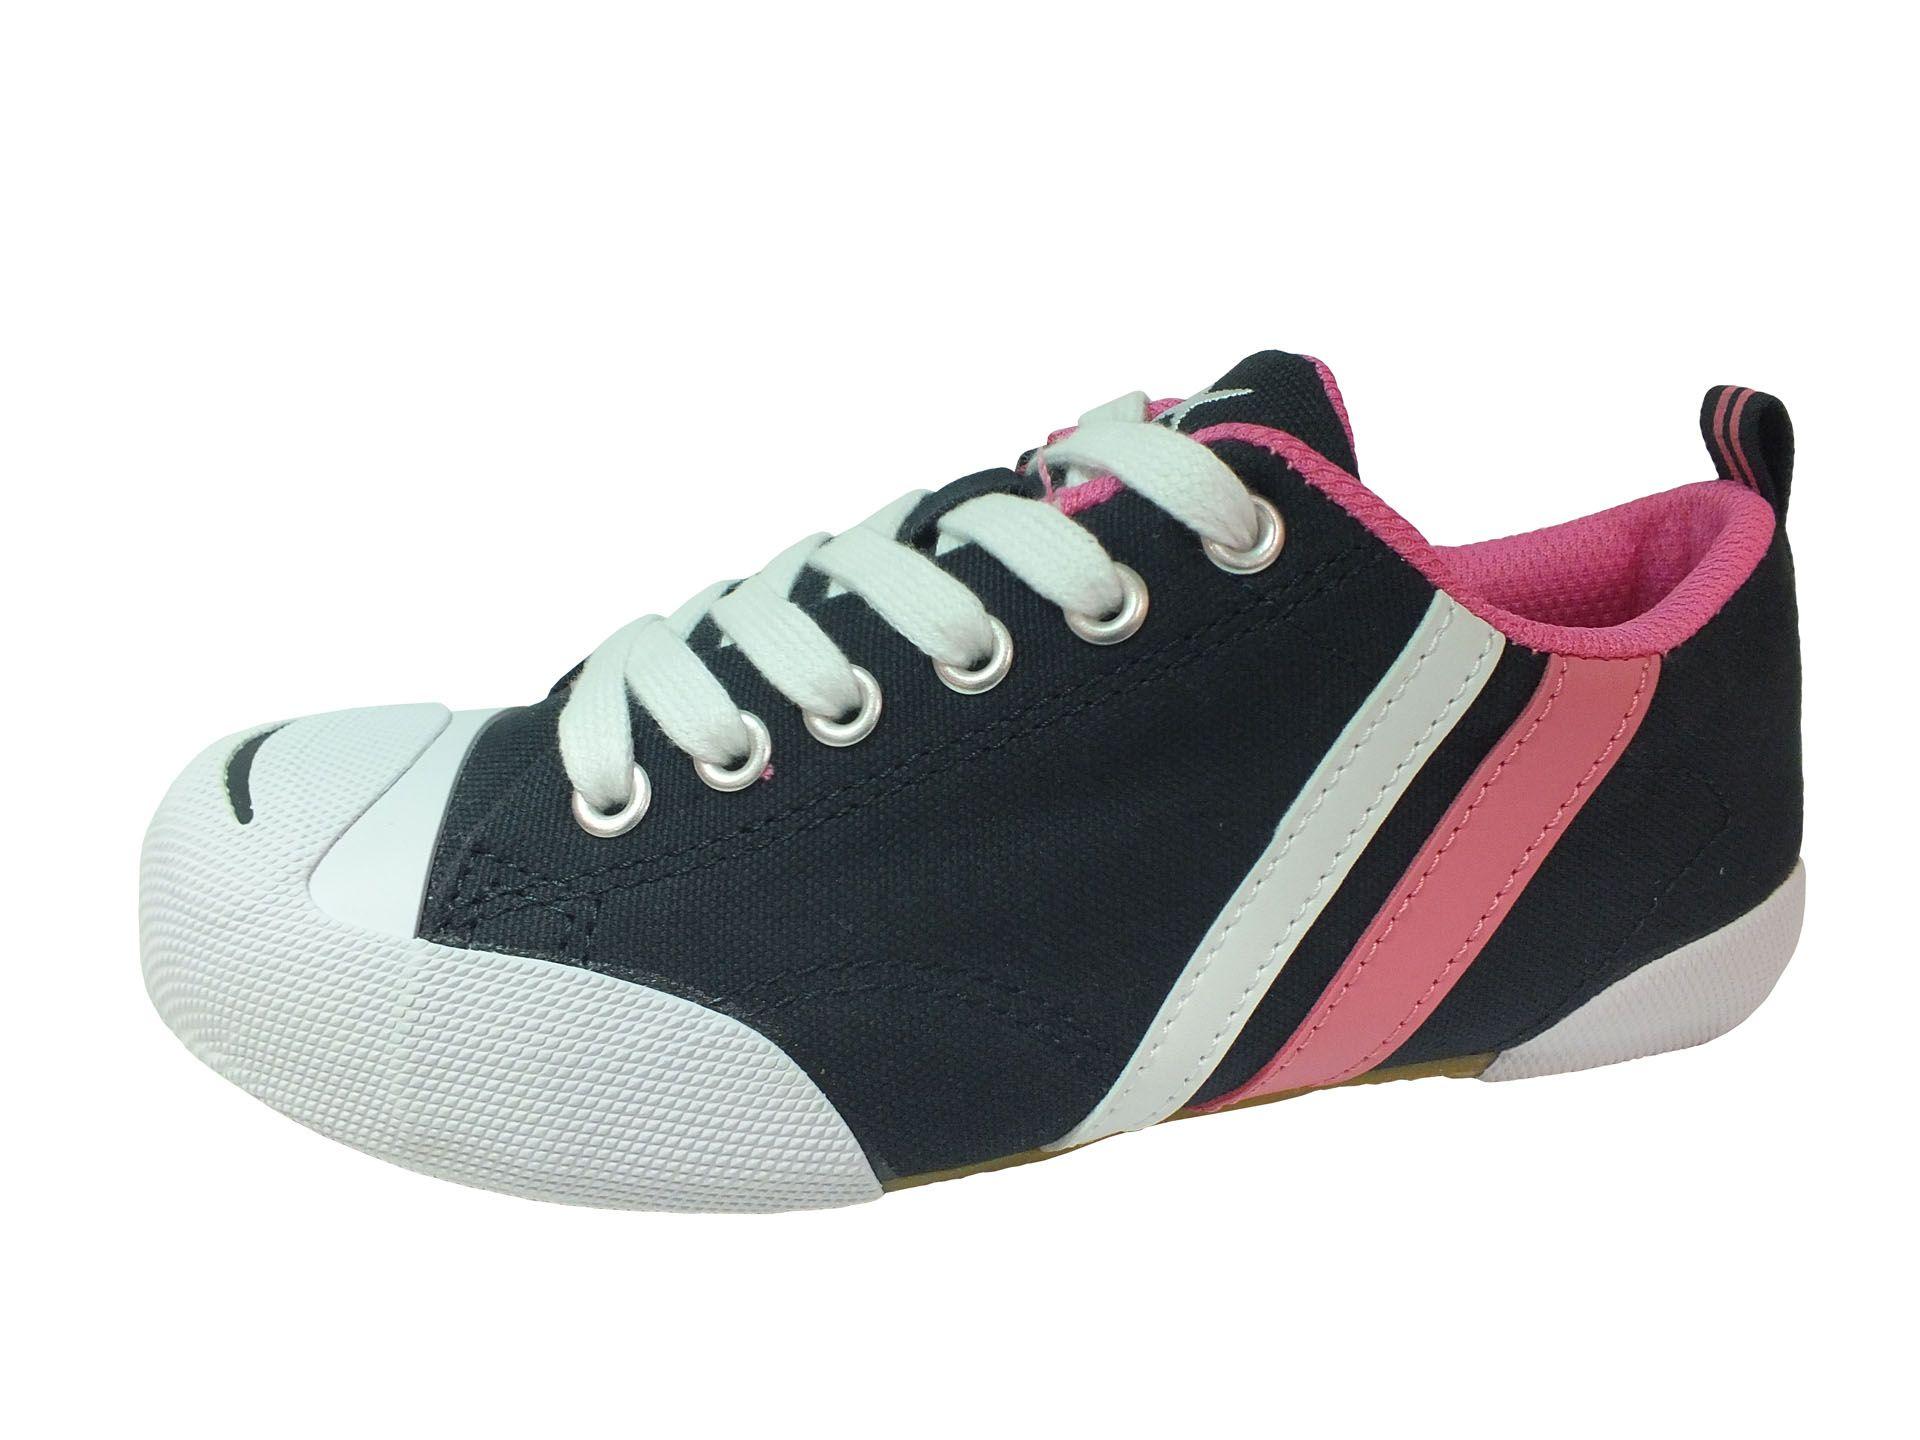 Kinetix Marka Bagcikli Laci Pembe Bayan Spor Ayakkabi Http Www Carikcim Com Kinetix Greenline Bagcikli Laci Pembe Bayan Spor Ayakkabi Shoes Sneakers Fashion